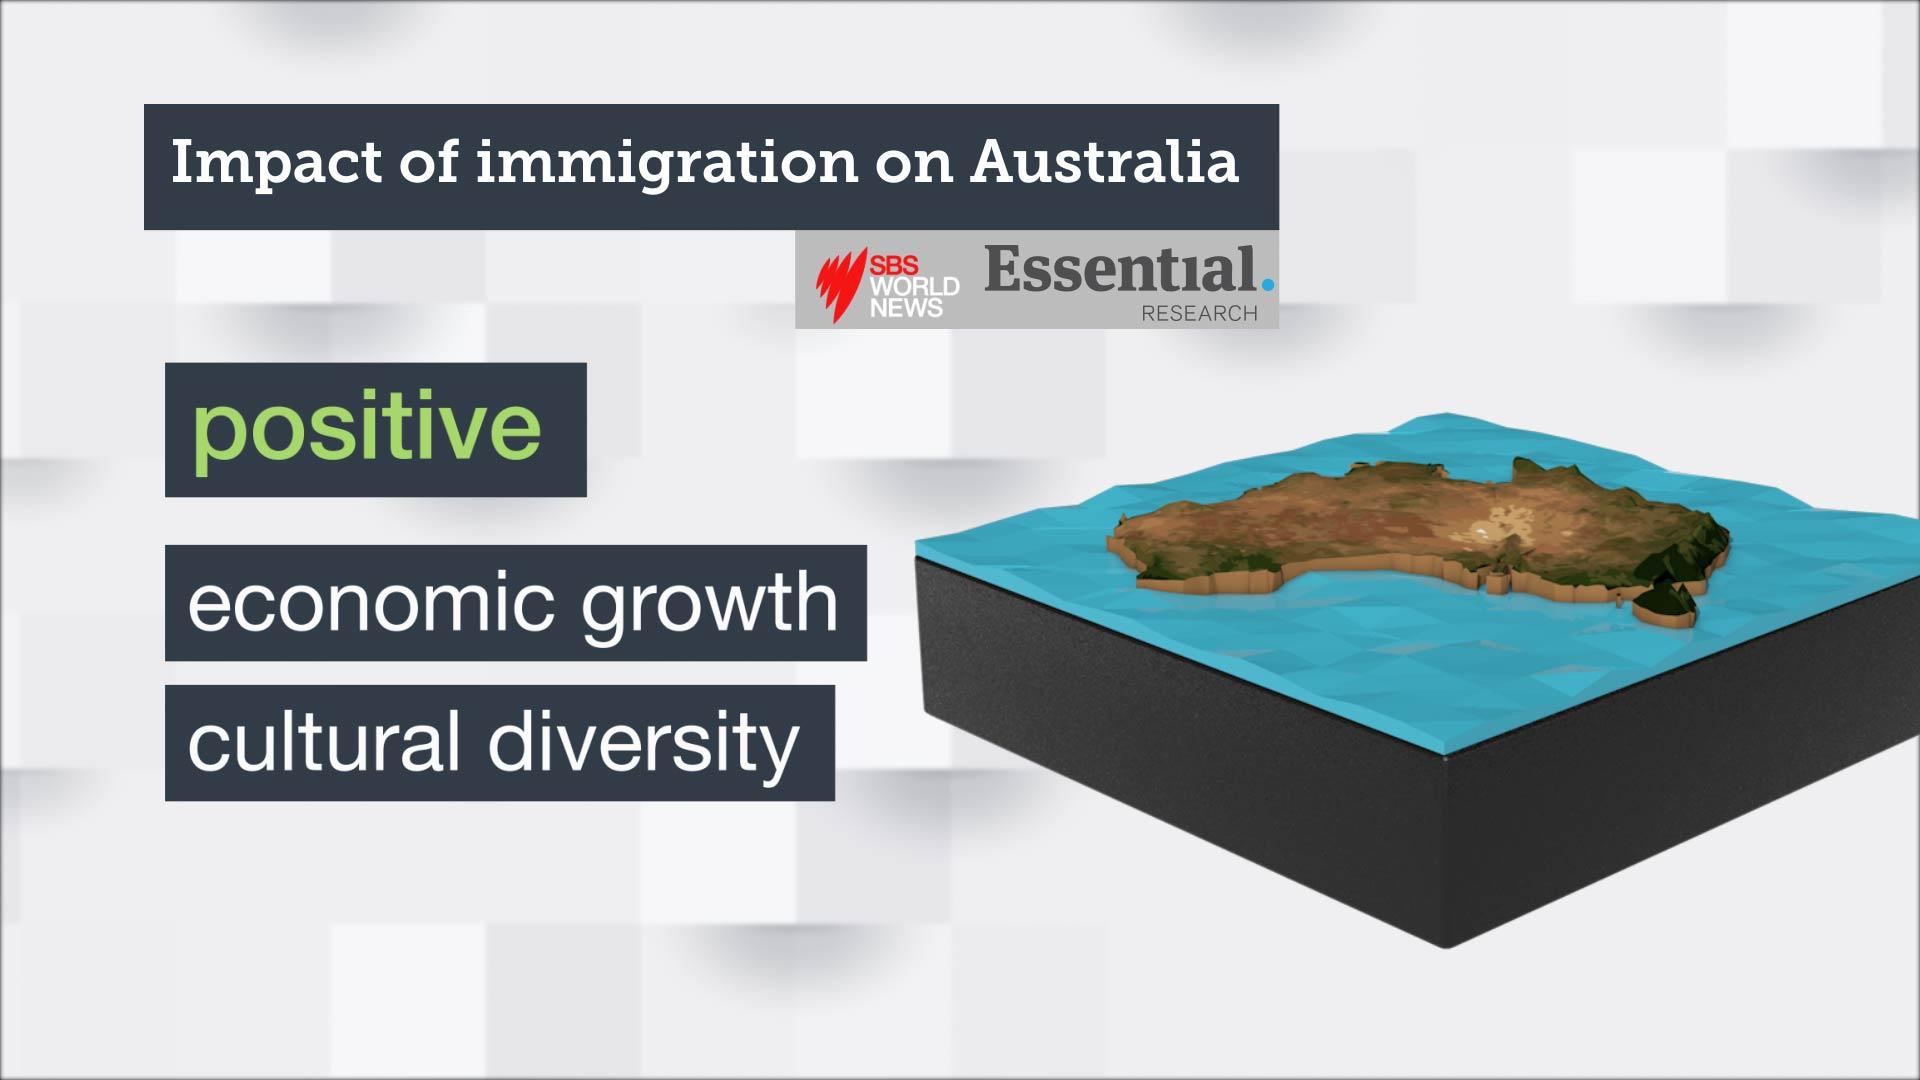 Impact of immigration on Australia